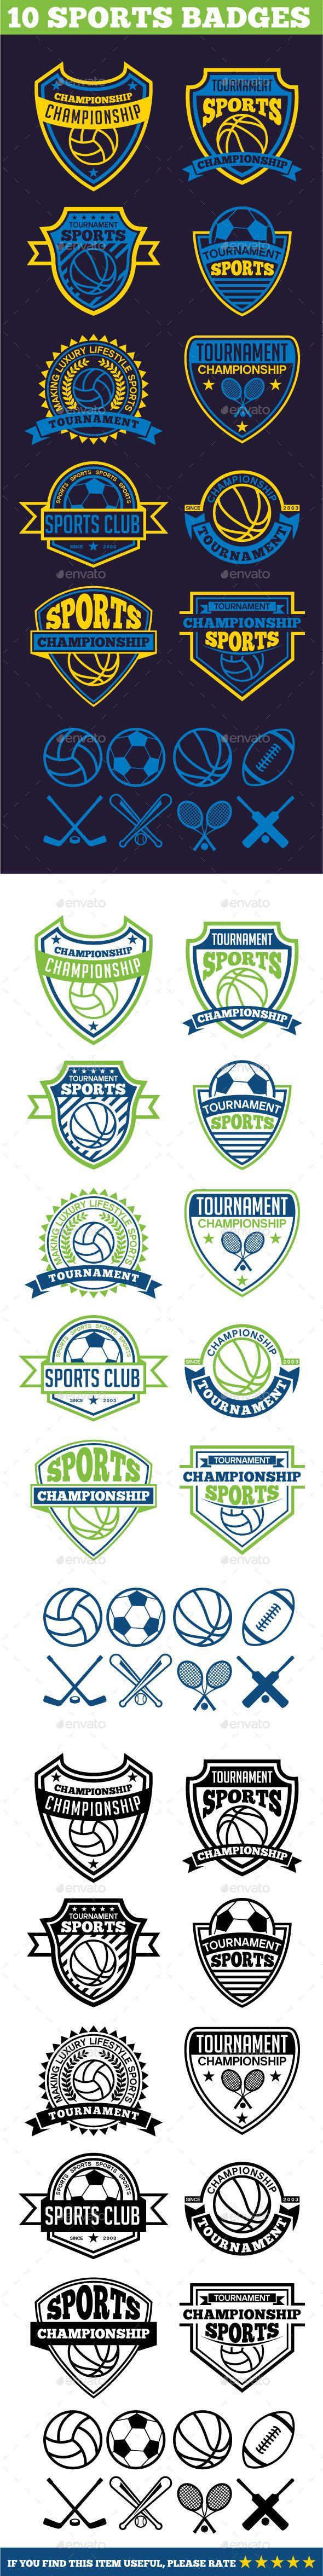 10 Sports Badges - Download…